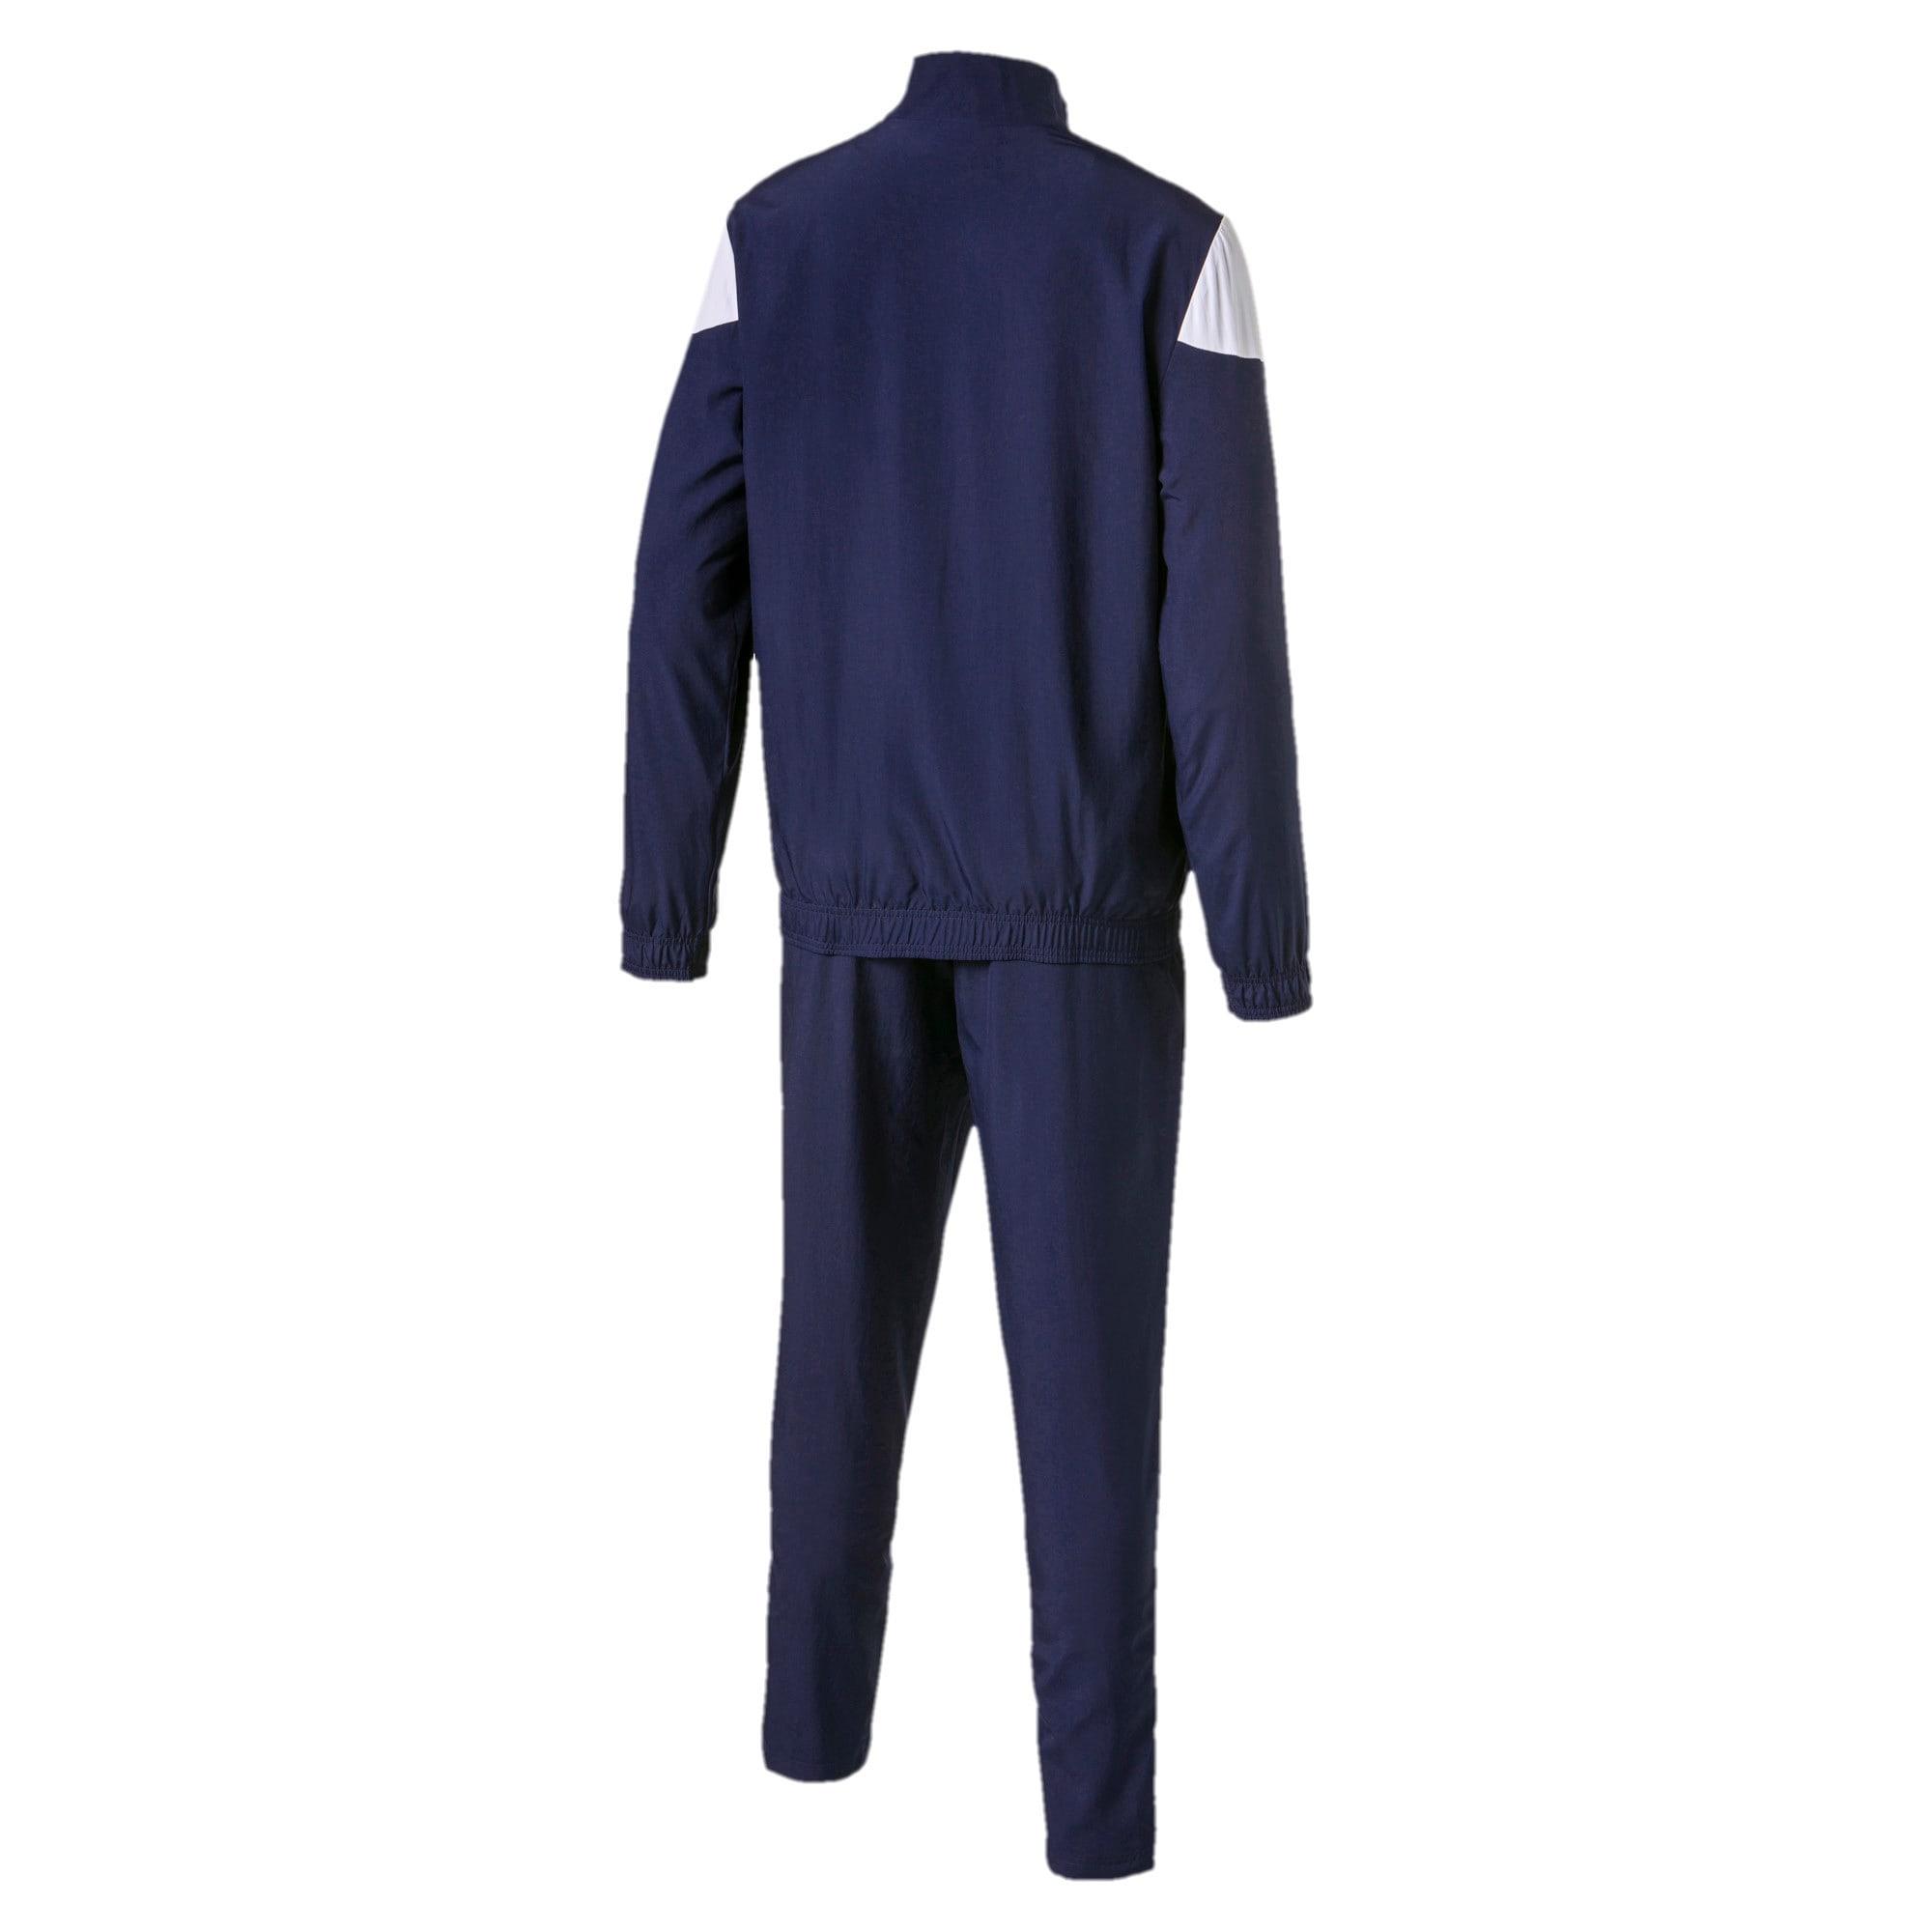 Thumbnail 5 of Clean Woven Suit OP, Peacoat, medium-IND